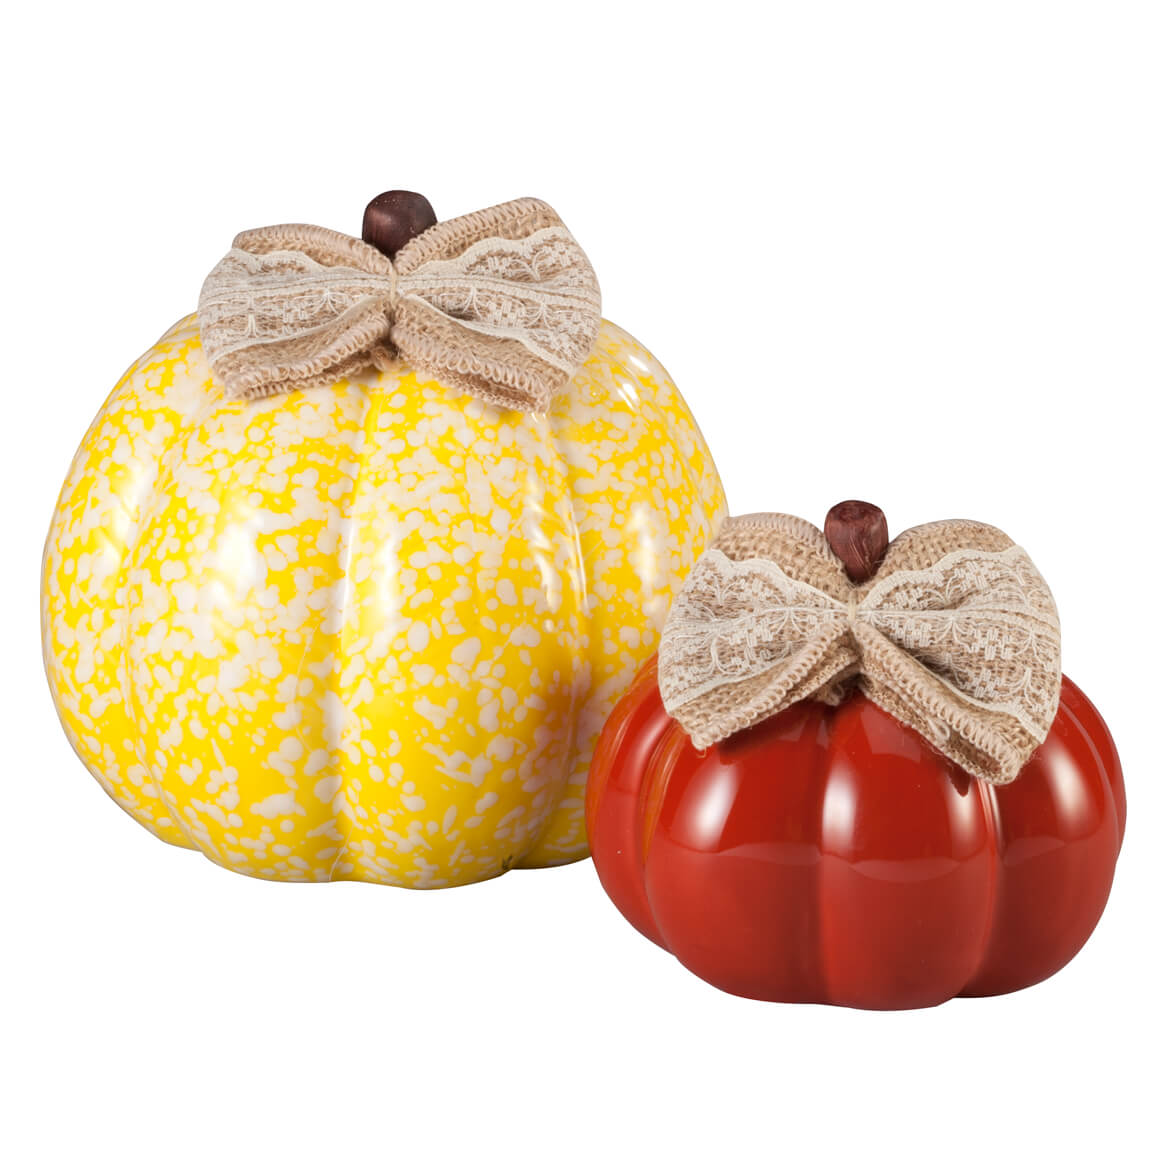 Small and Medium Ceramic Decorative Pumpkins